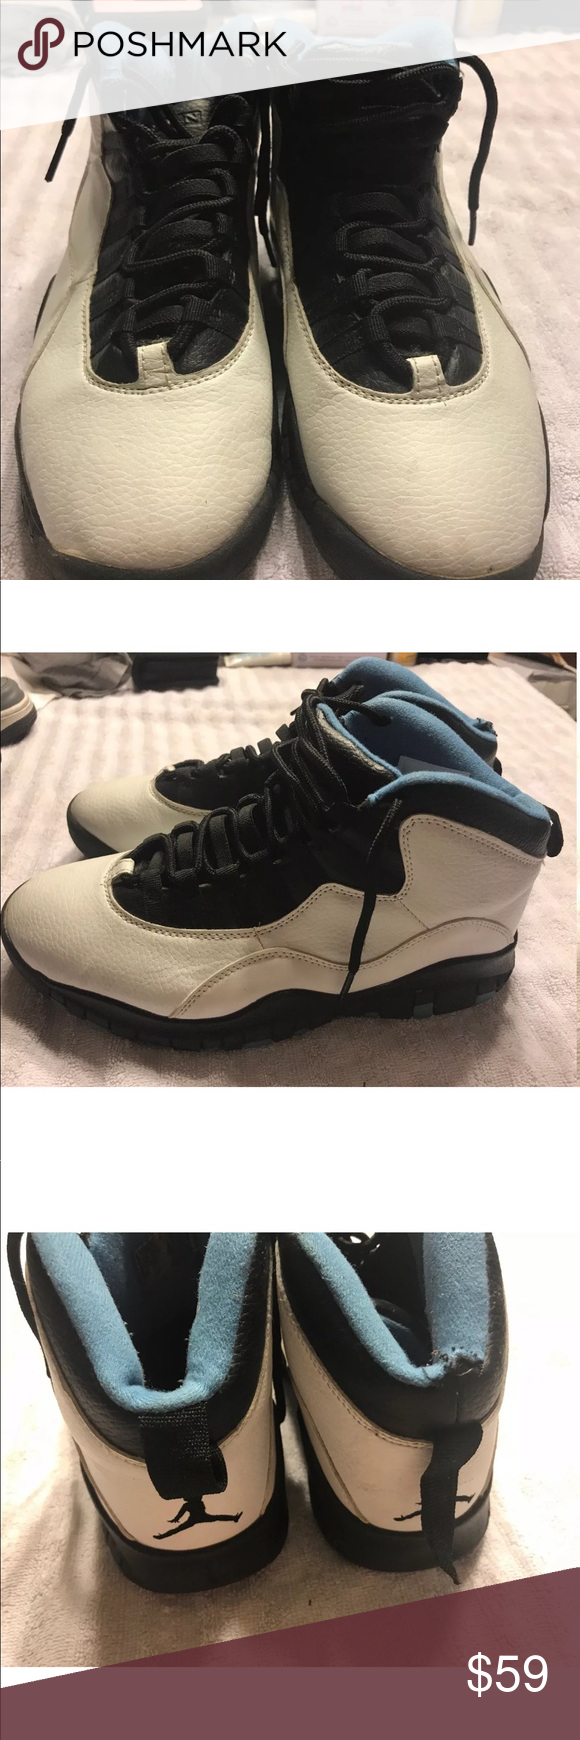 "adab70d5692 Nike Air Jordan Retro X 10 ""Powder Blue"" MENS 8 In my closet I have ..."